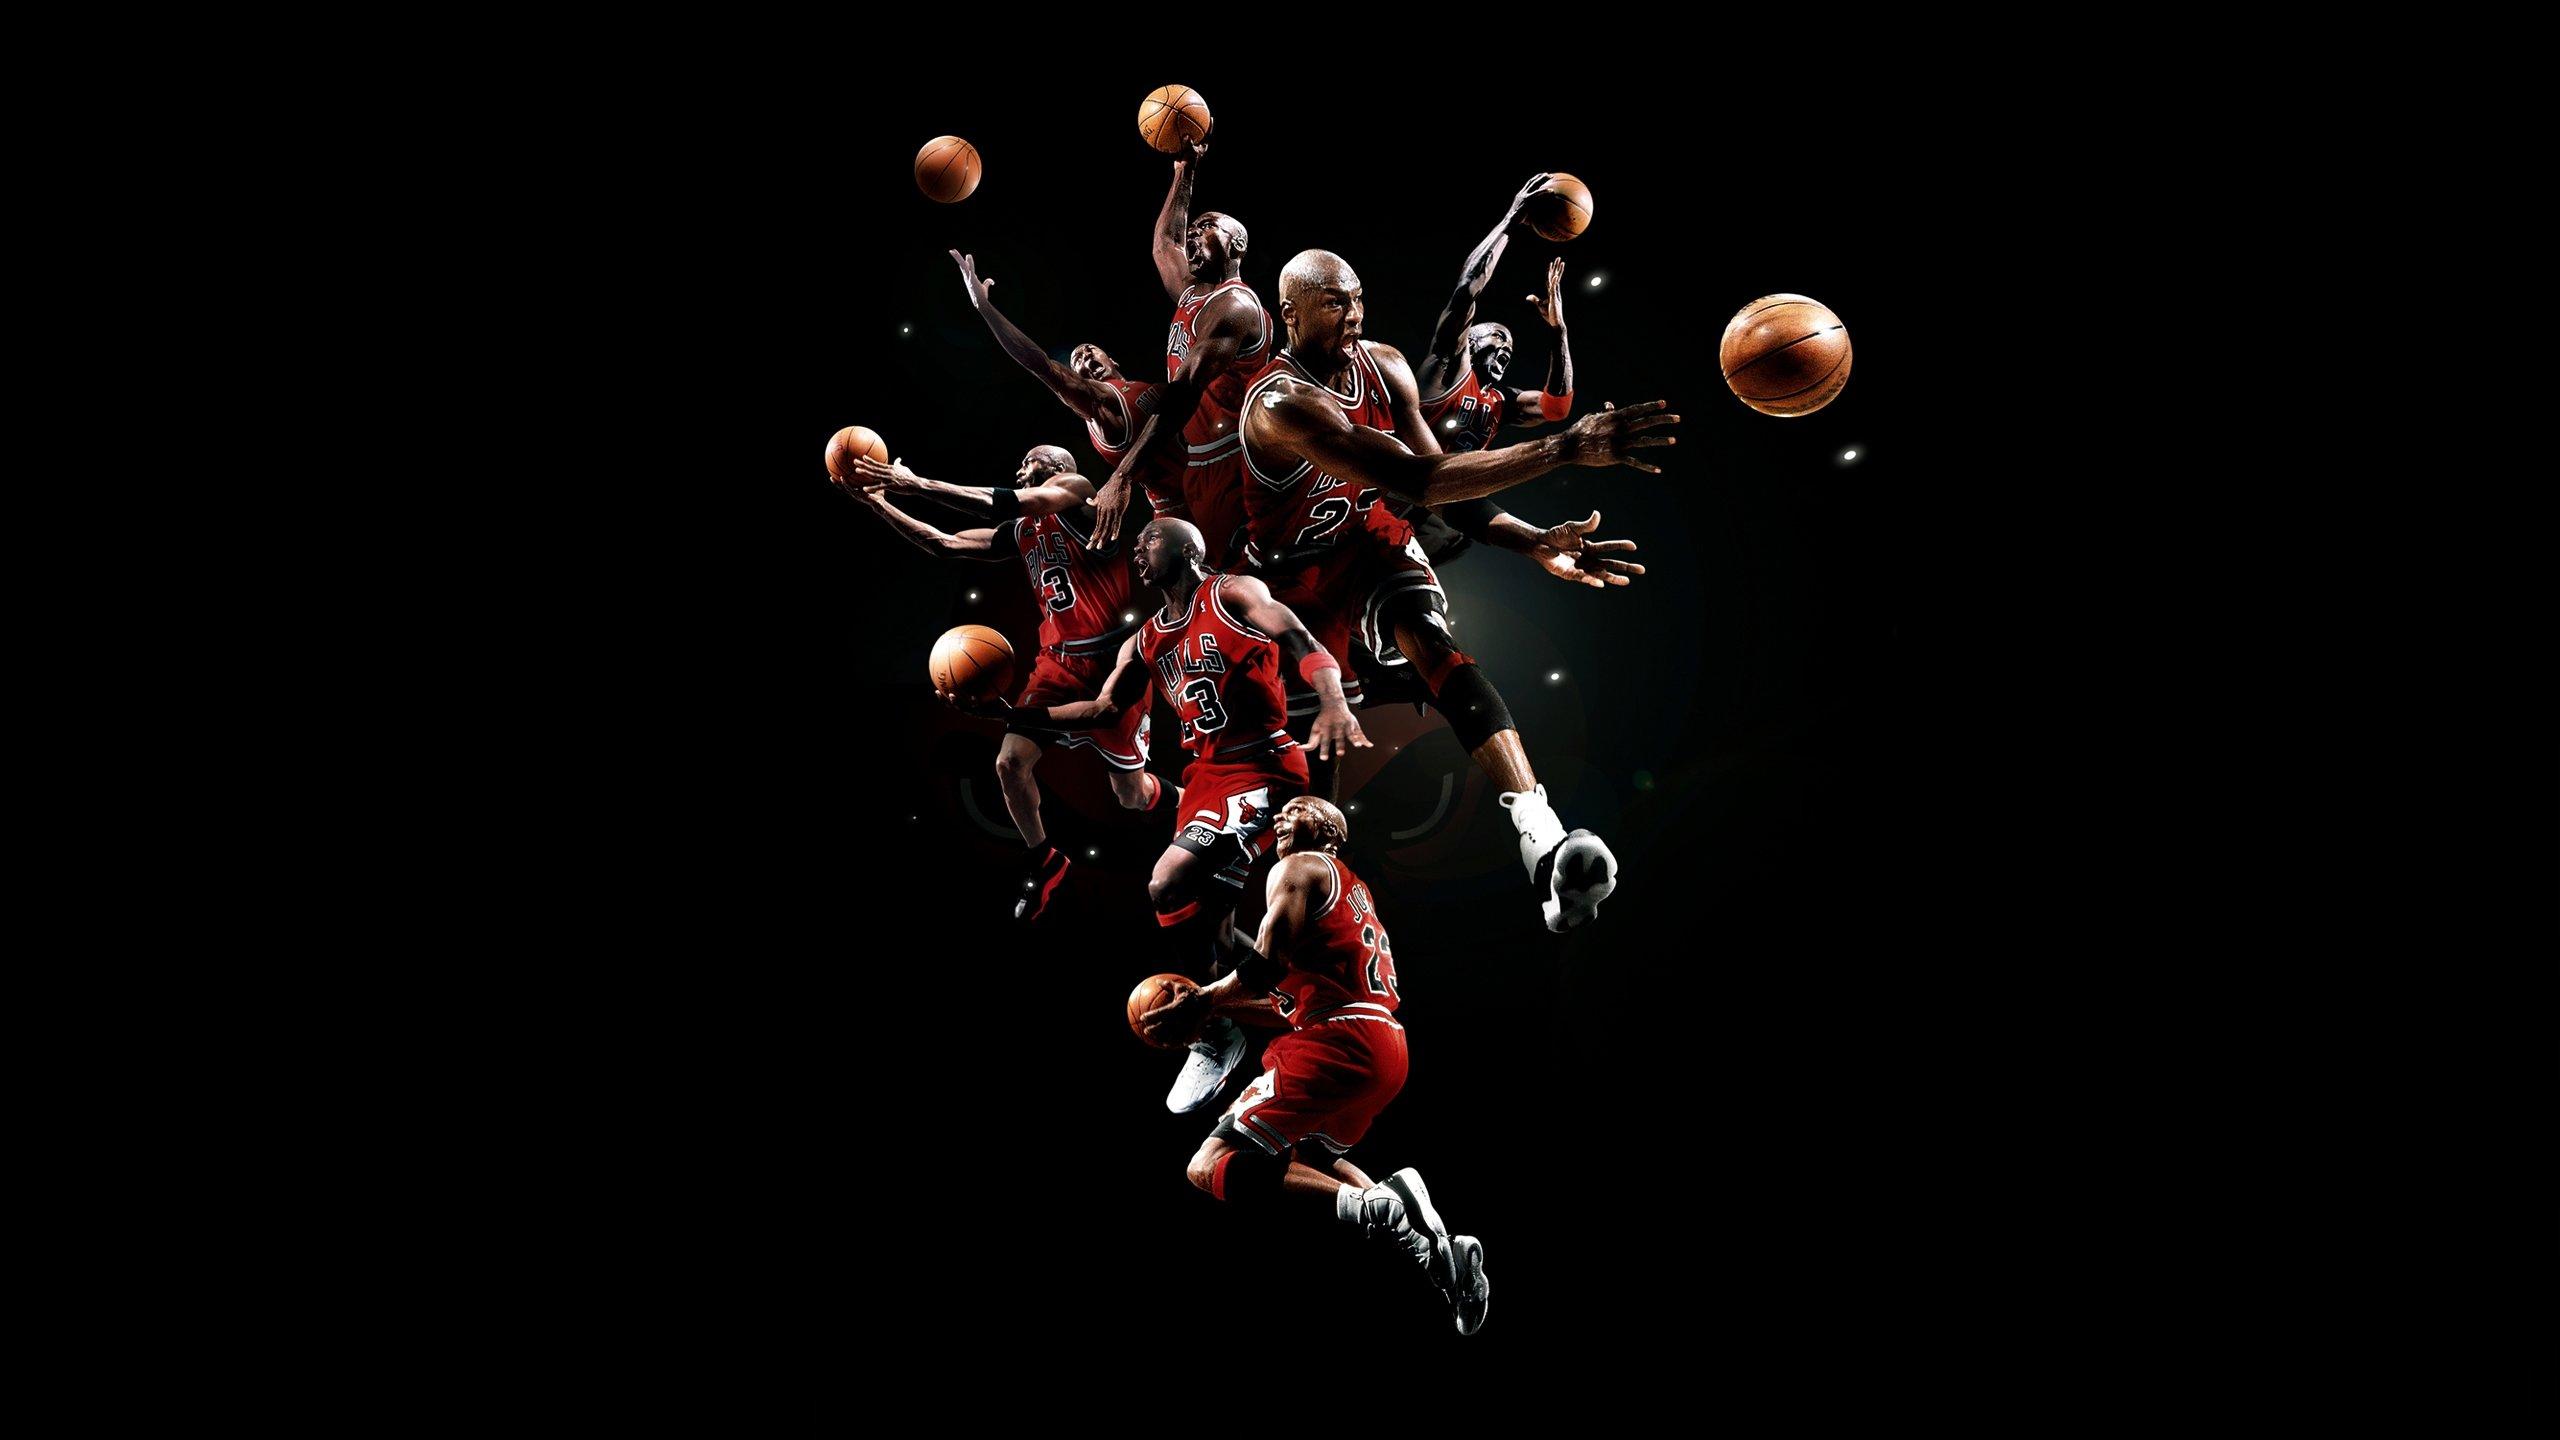 Fondos de pantalla Michael Jordan Poster